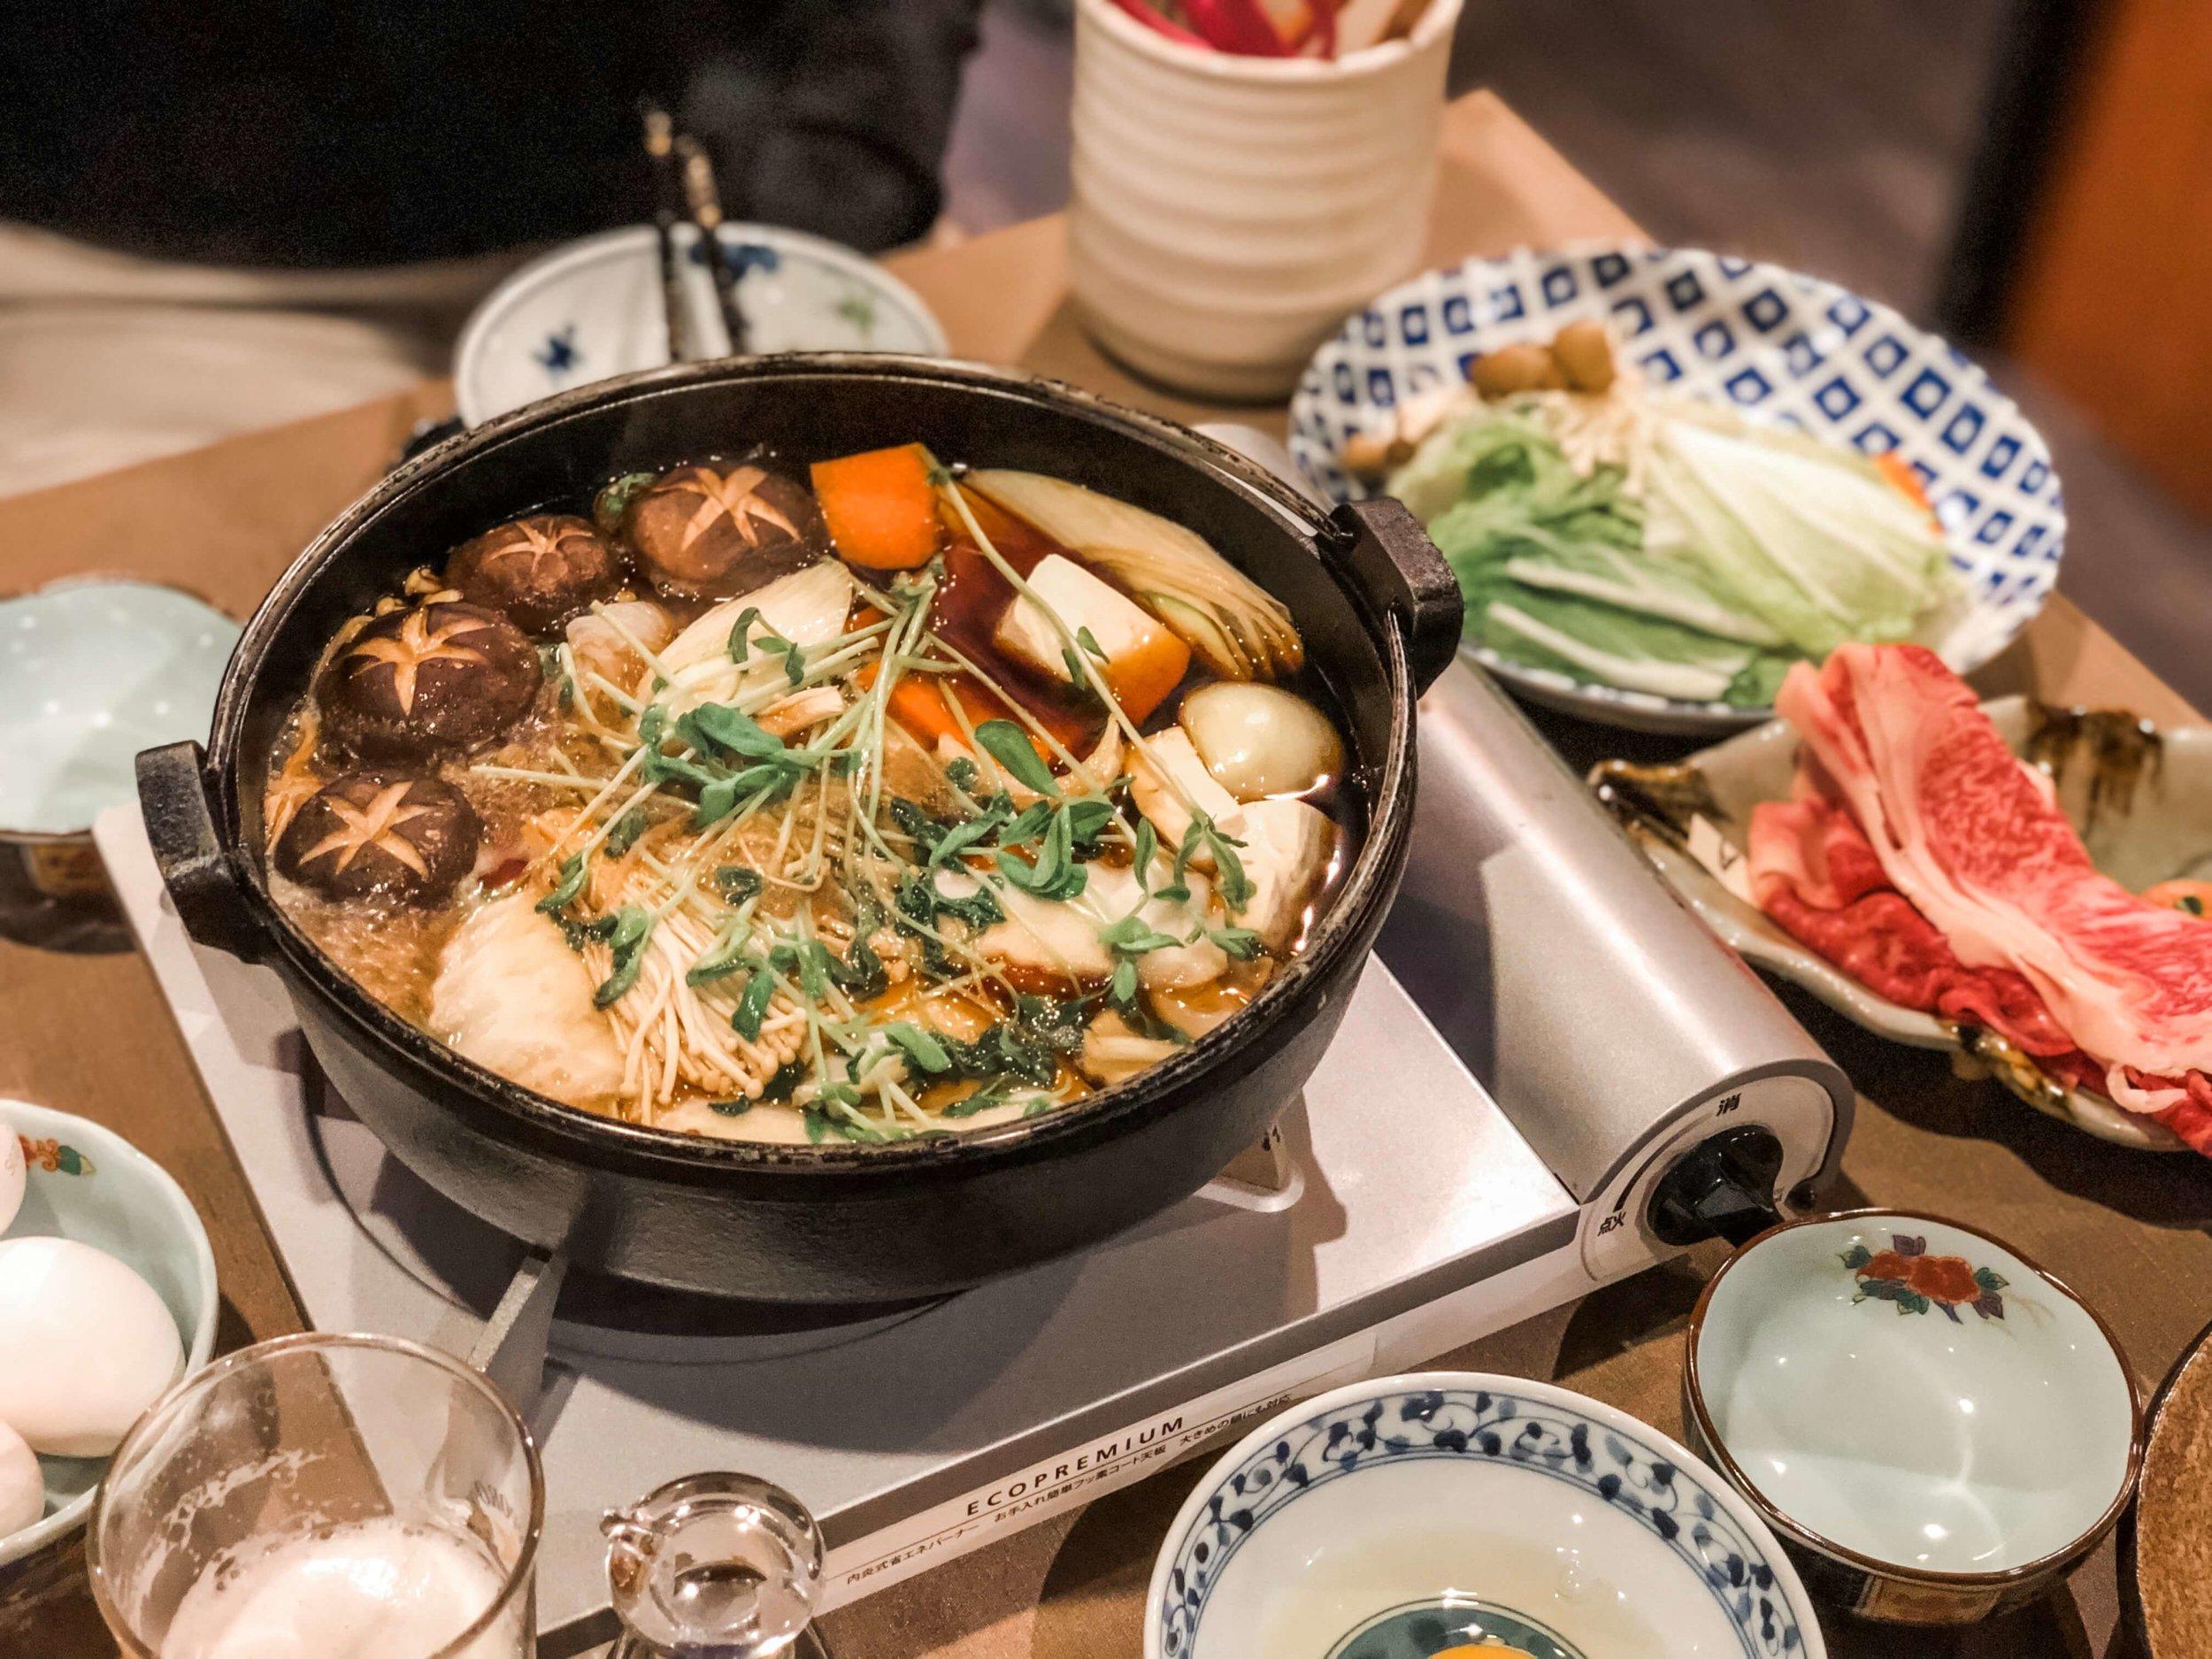 Best places to eat in Niseko Japan - Sessa Hotpot